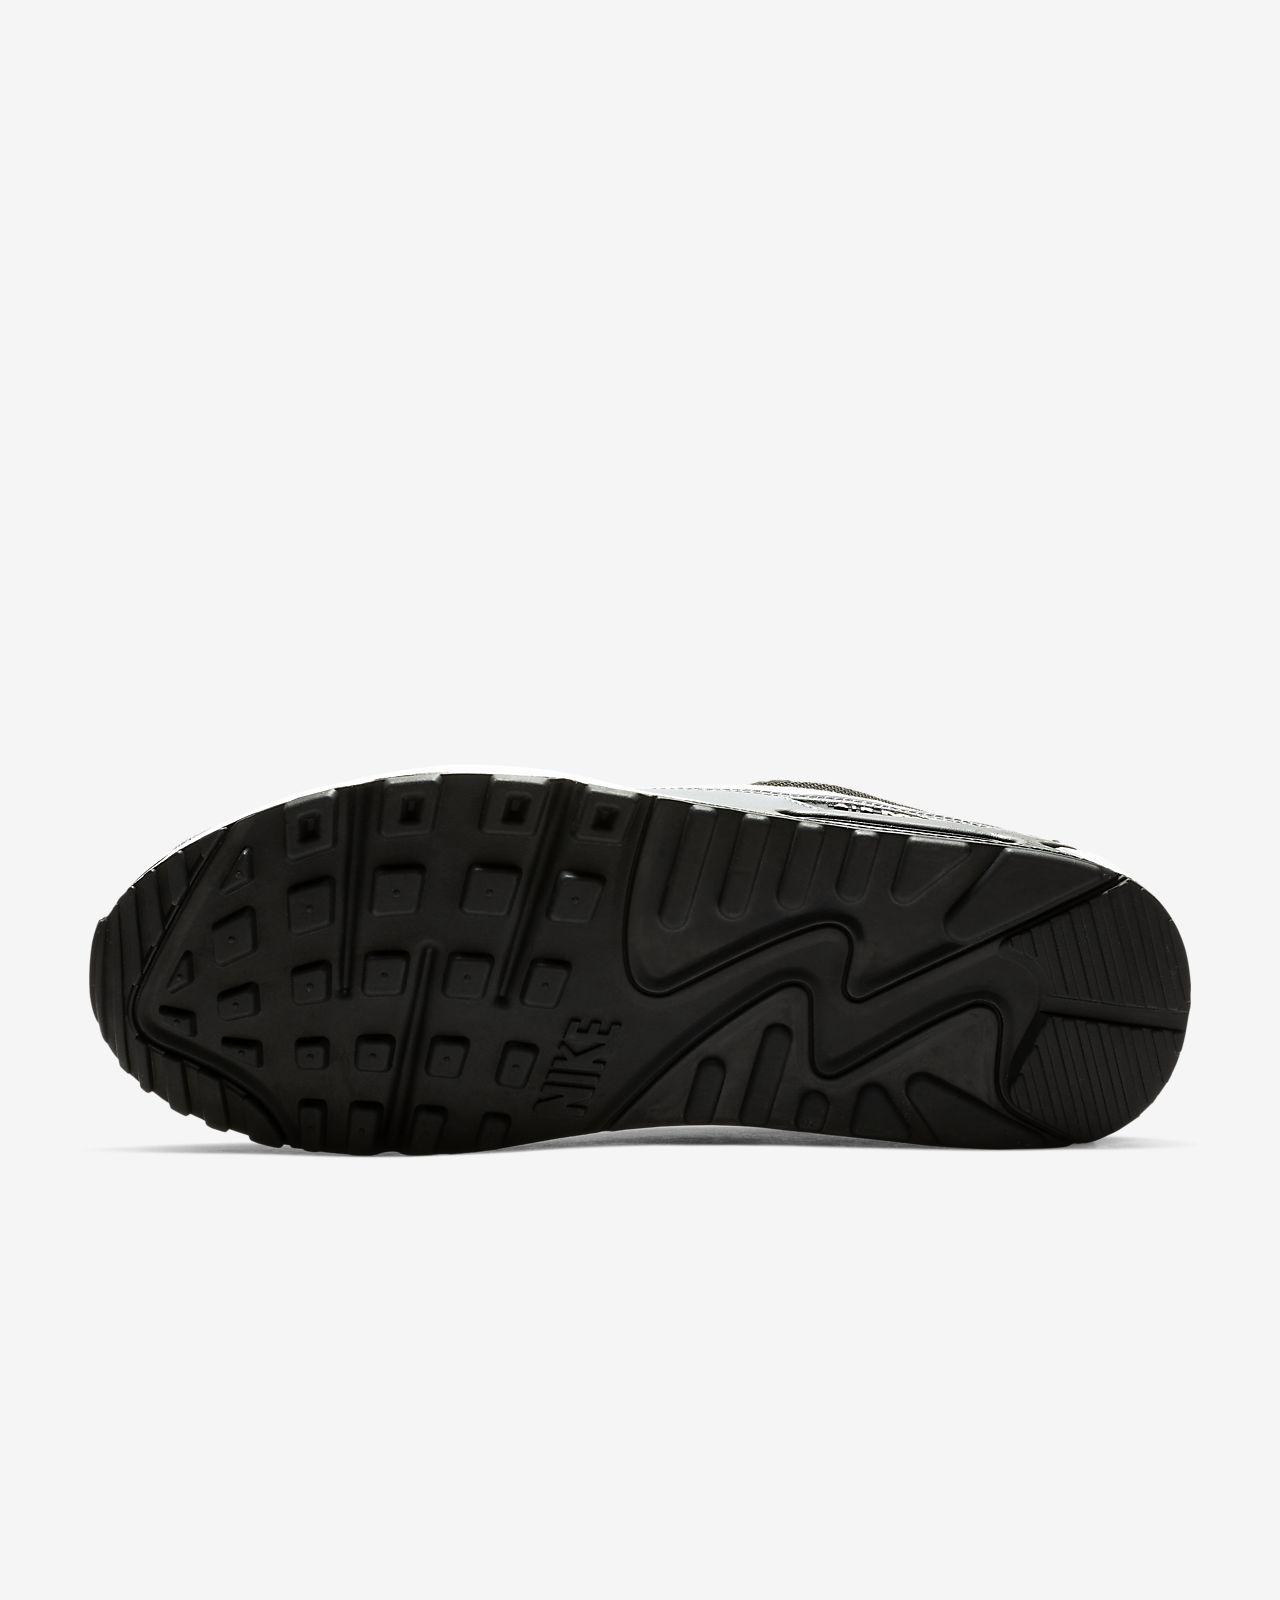 cheap for discount 4aba1 6a6e8 ... Chaussure Nike Air Max 90 Essential pour Homme